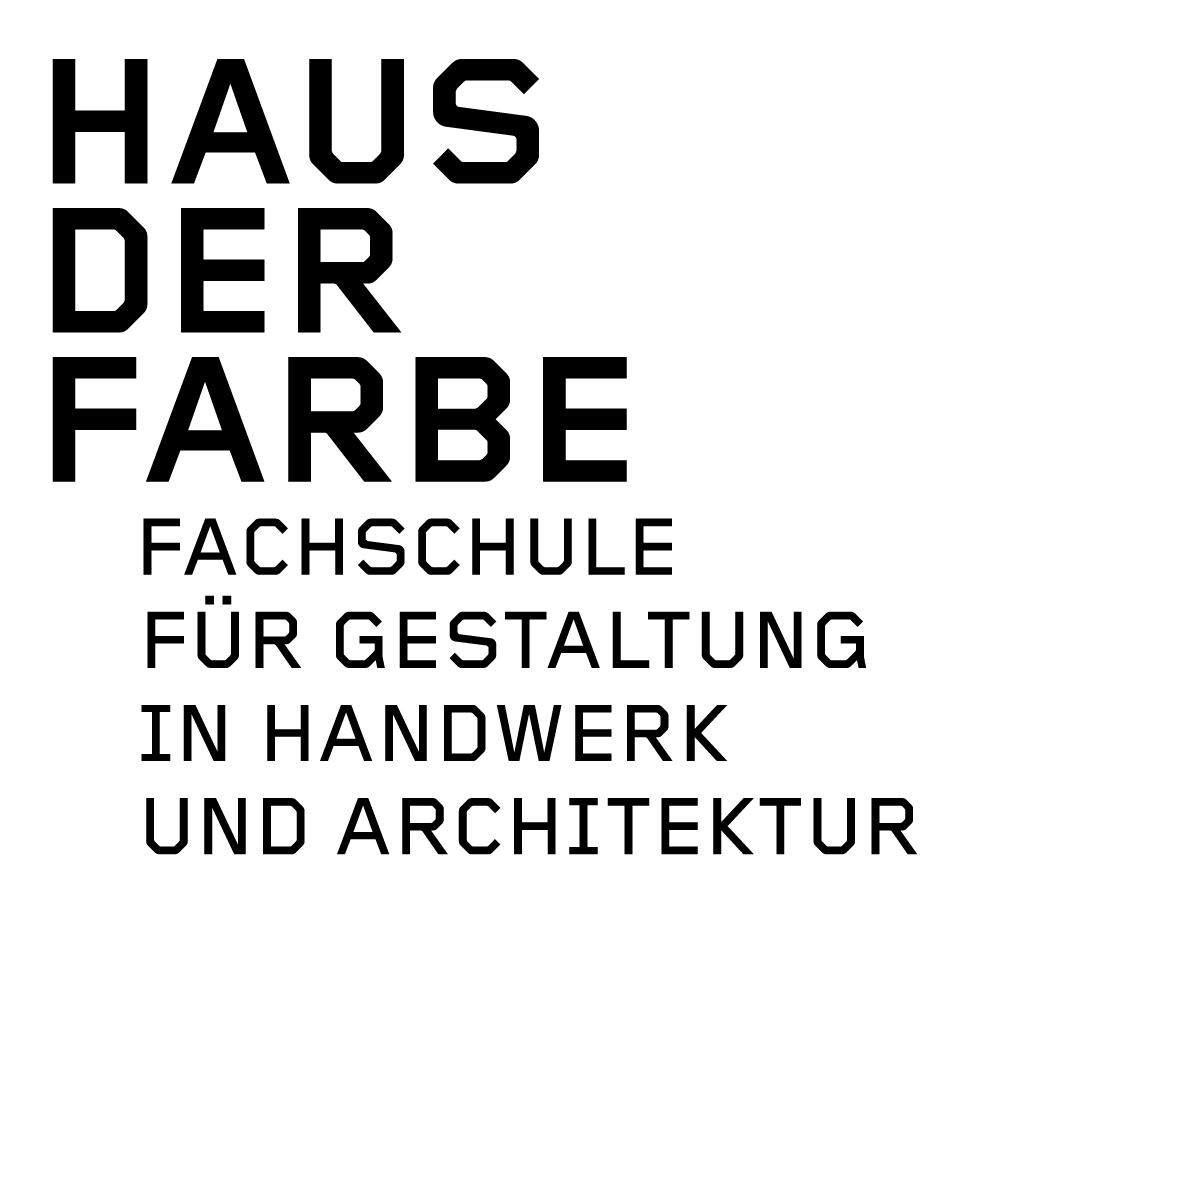 haus-de-farbe-logo-haus-der-farbe-jpg-3480